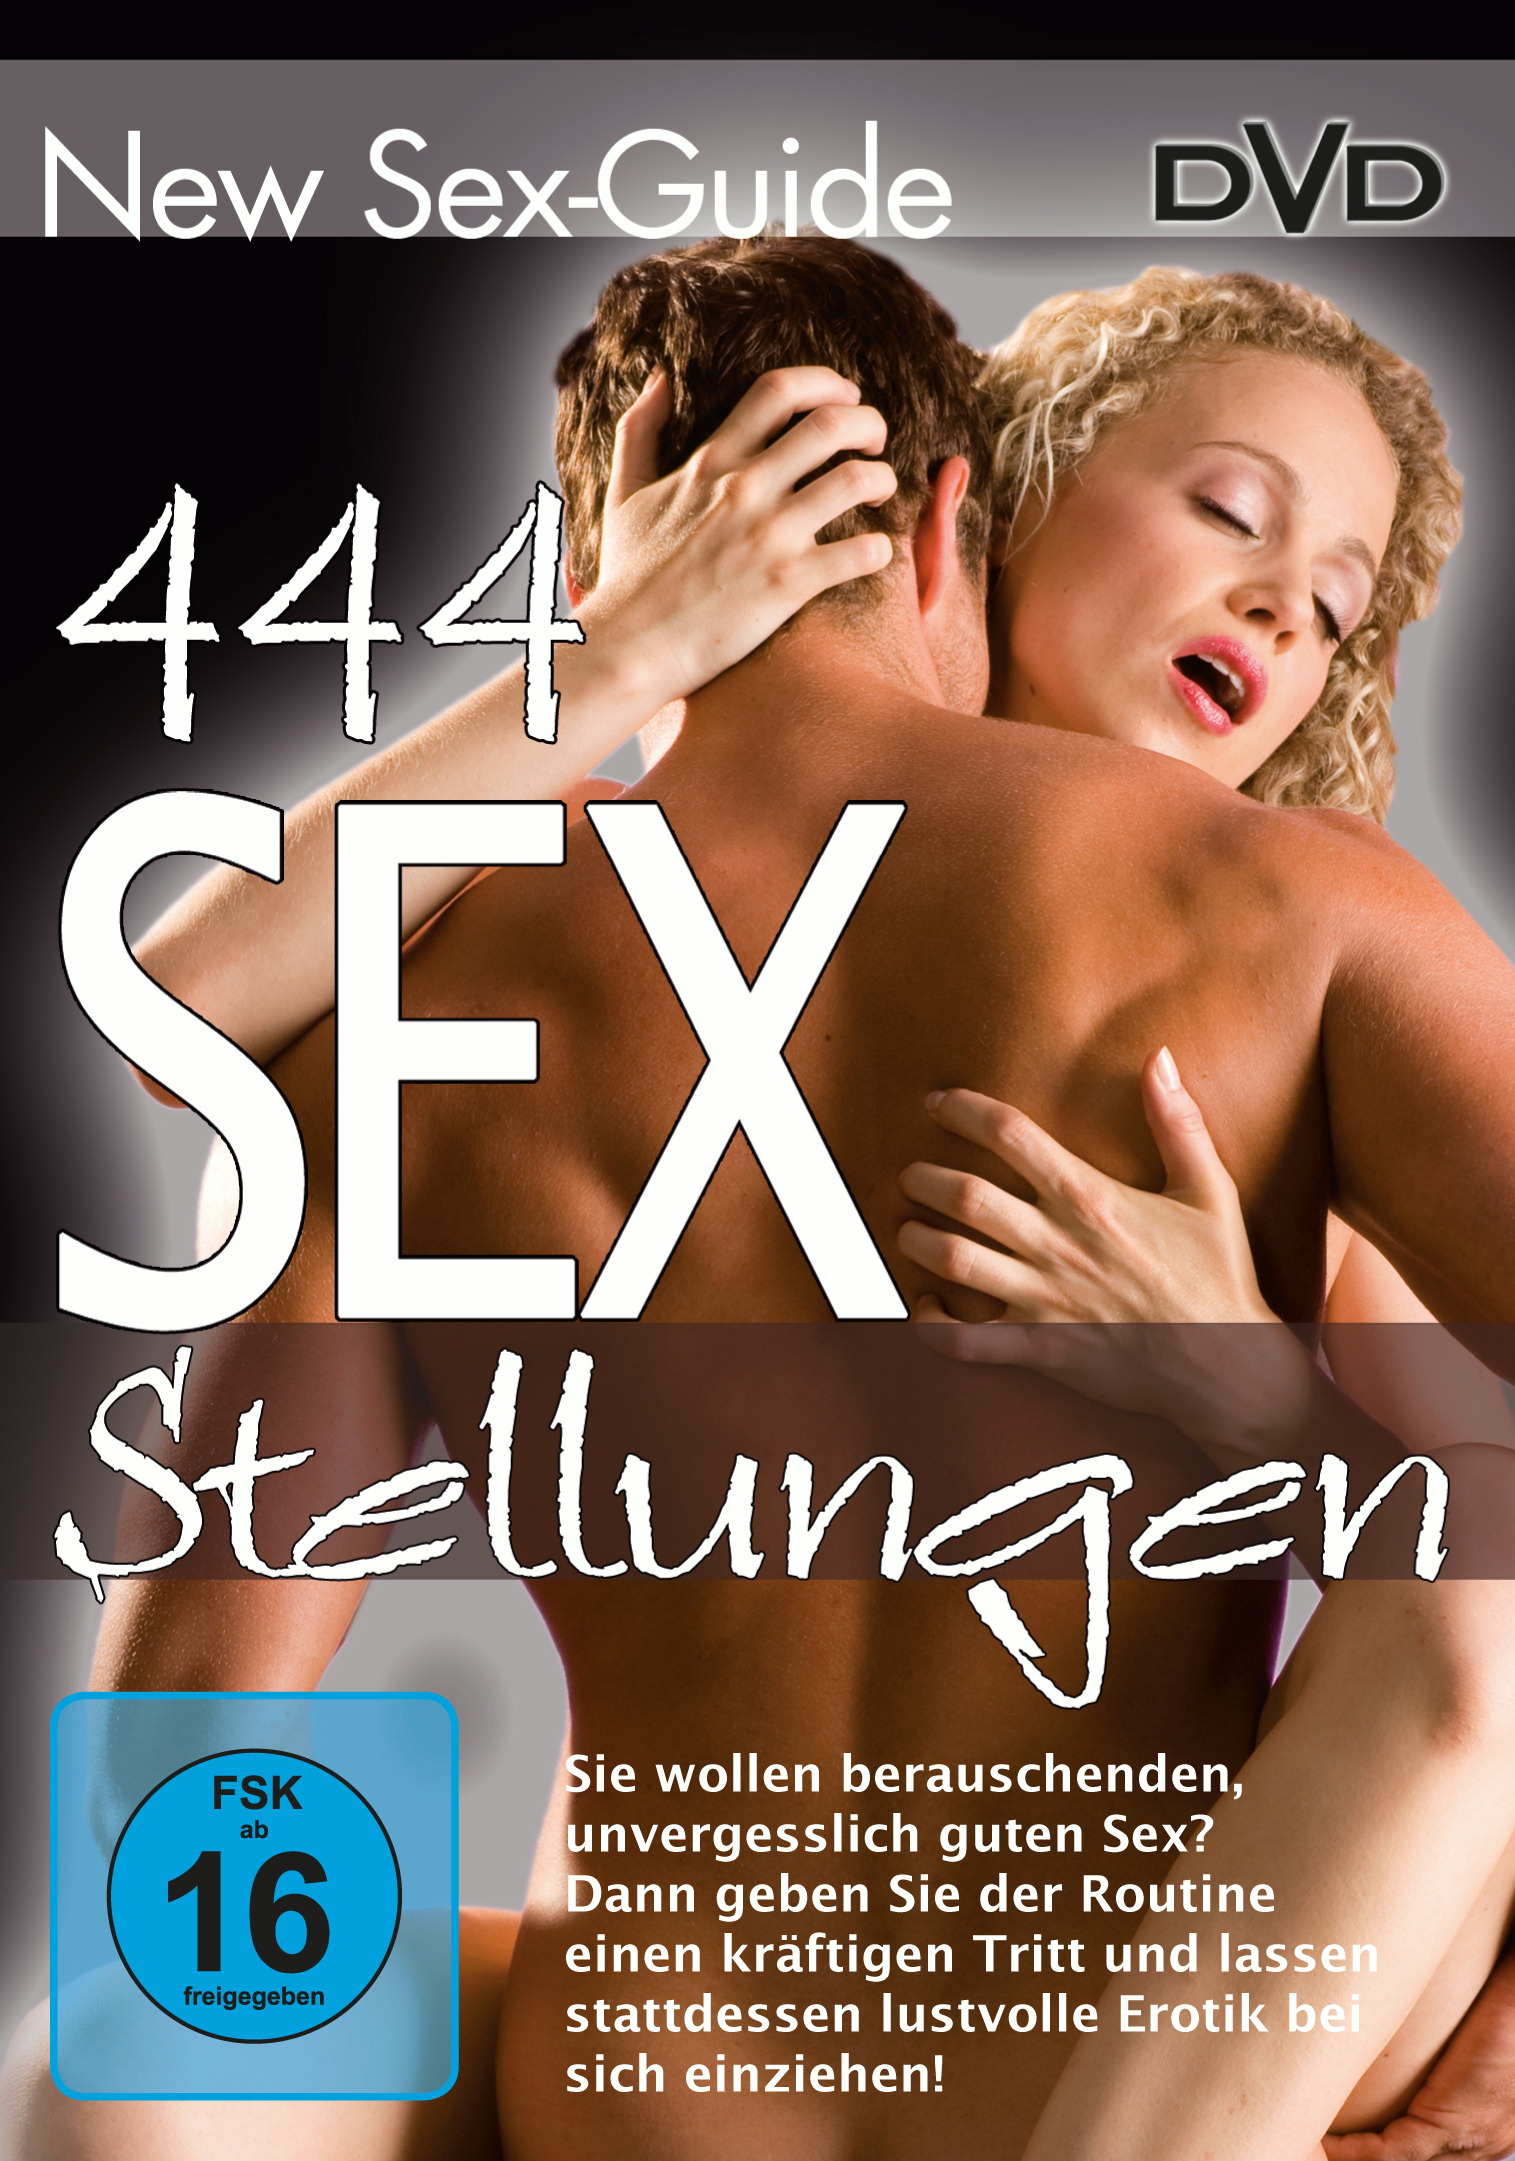 Video Guide Sex 14